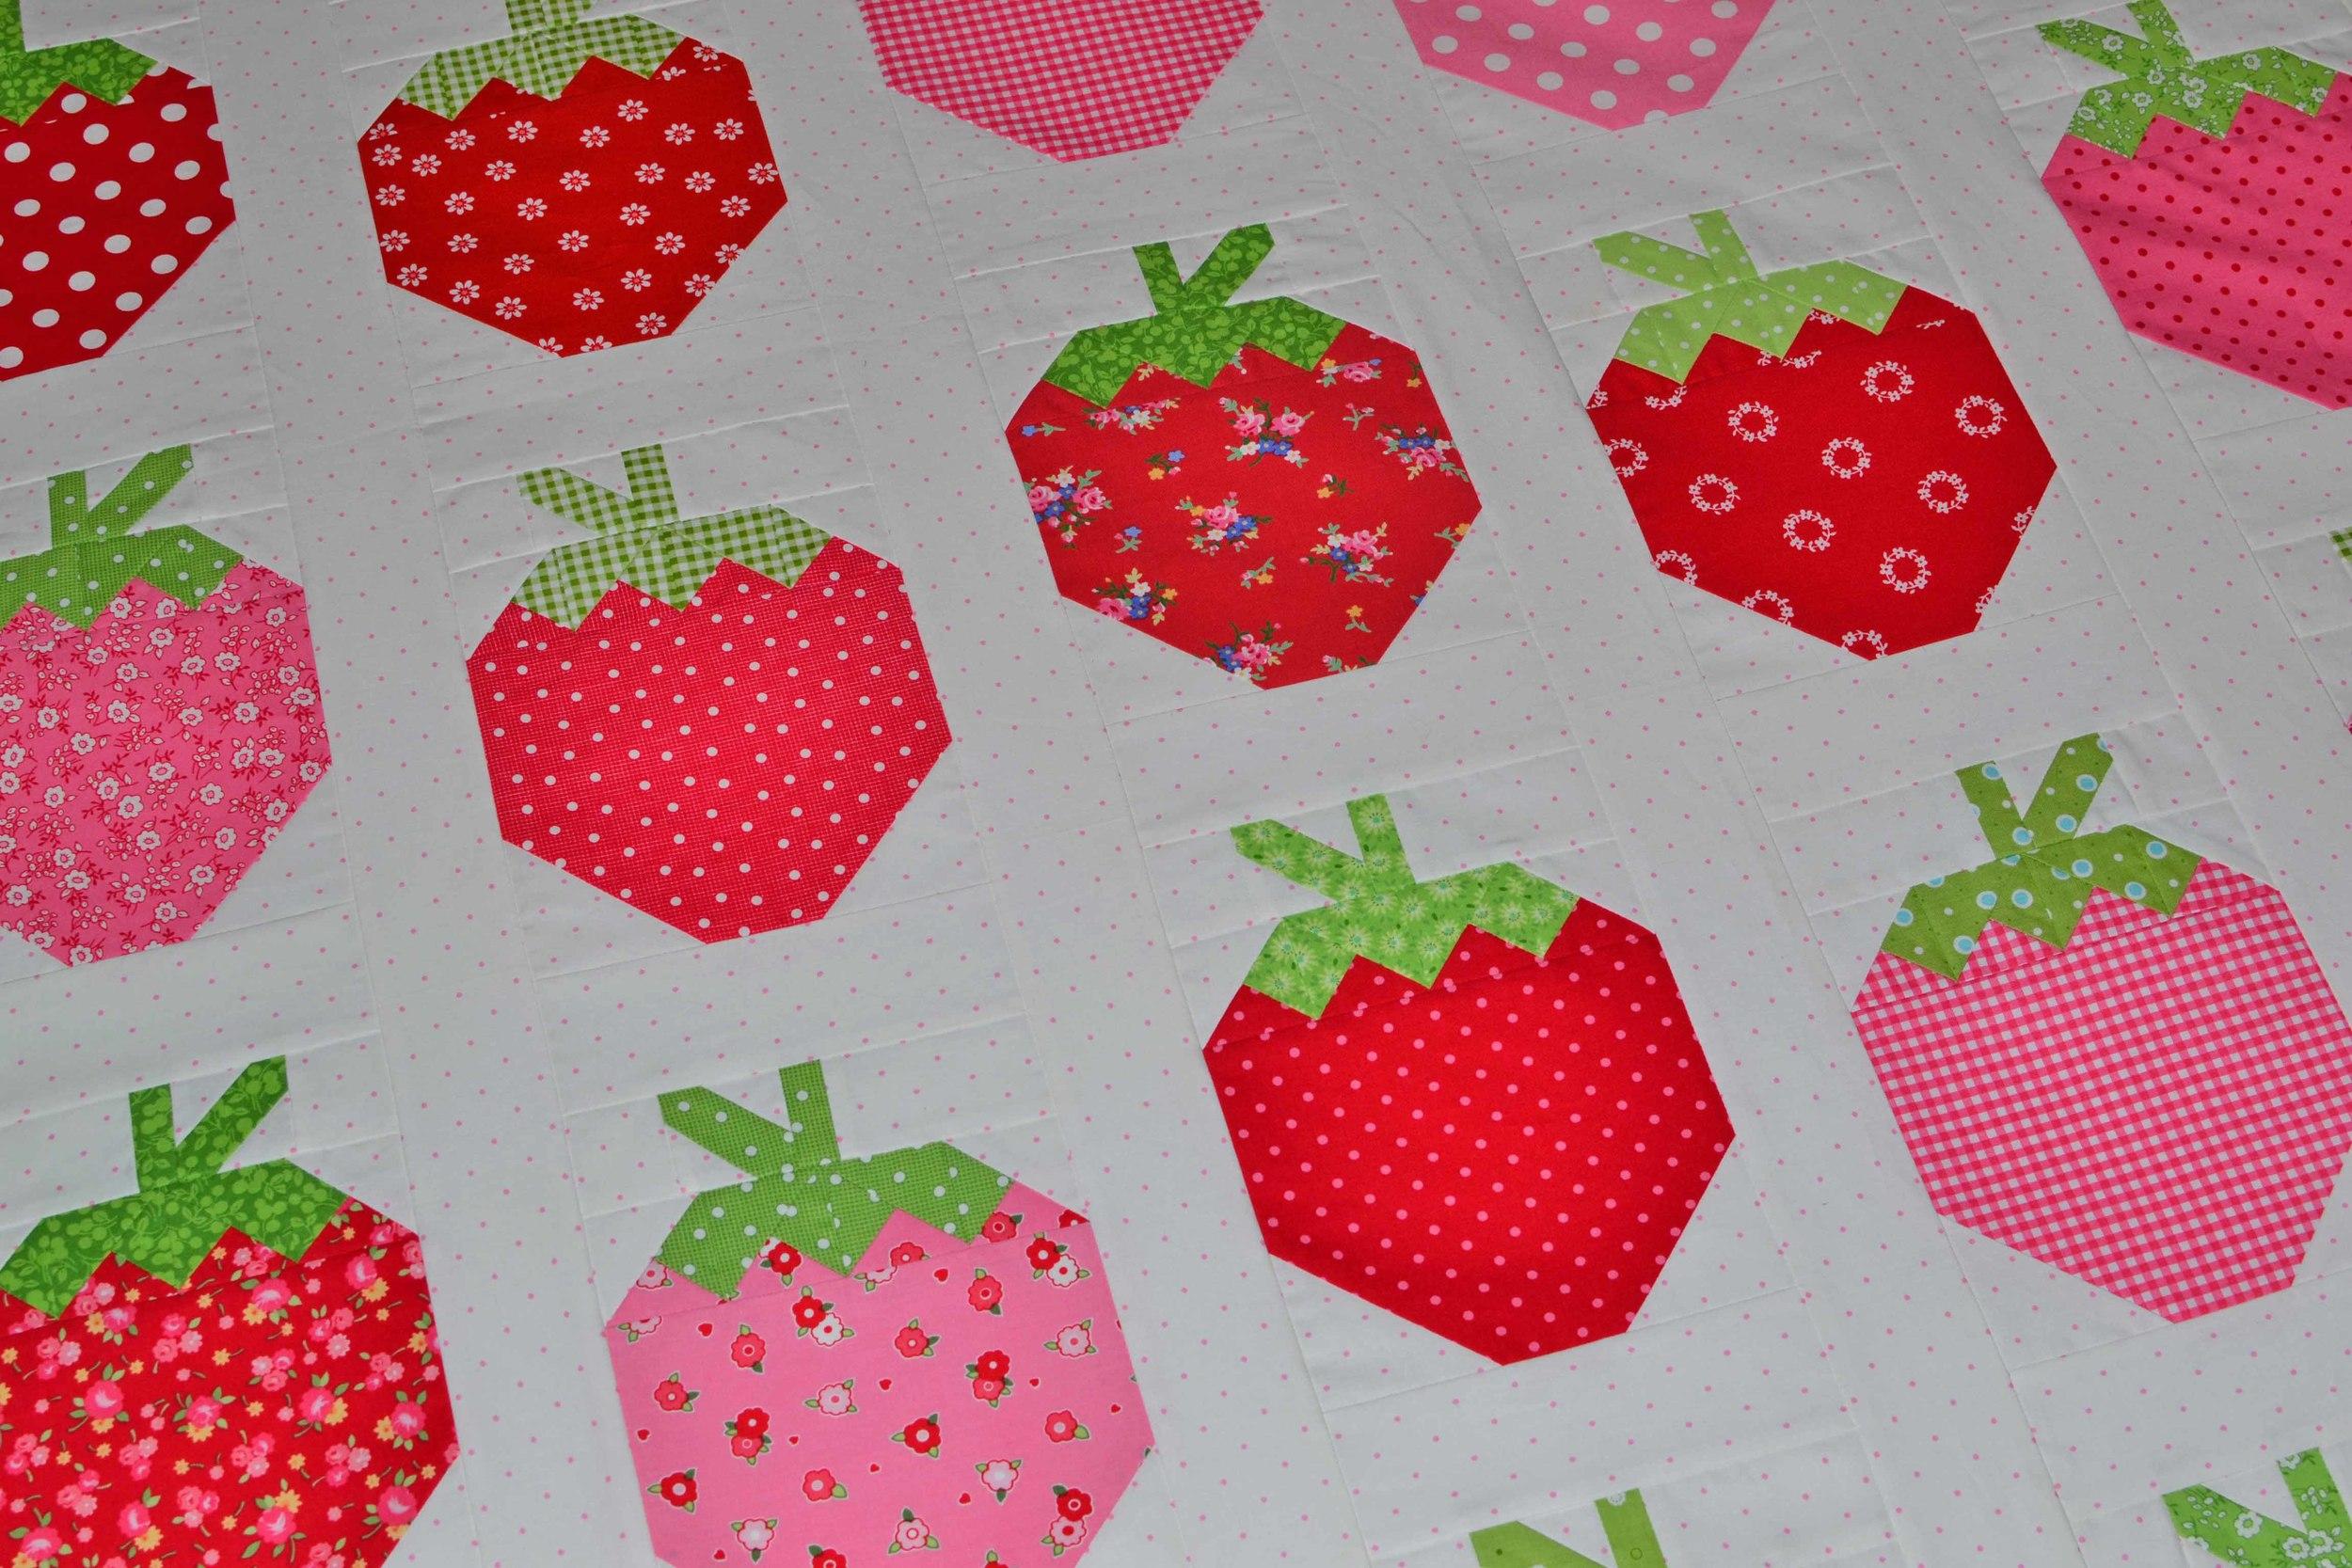 strawberry social 023.JPG